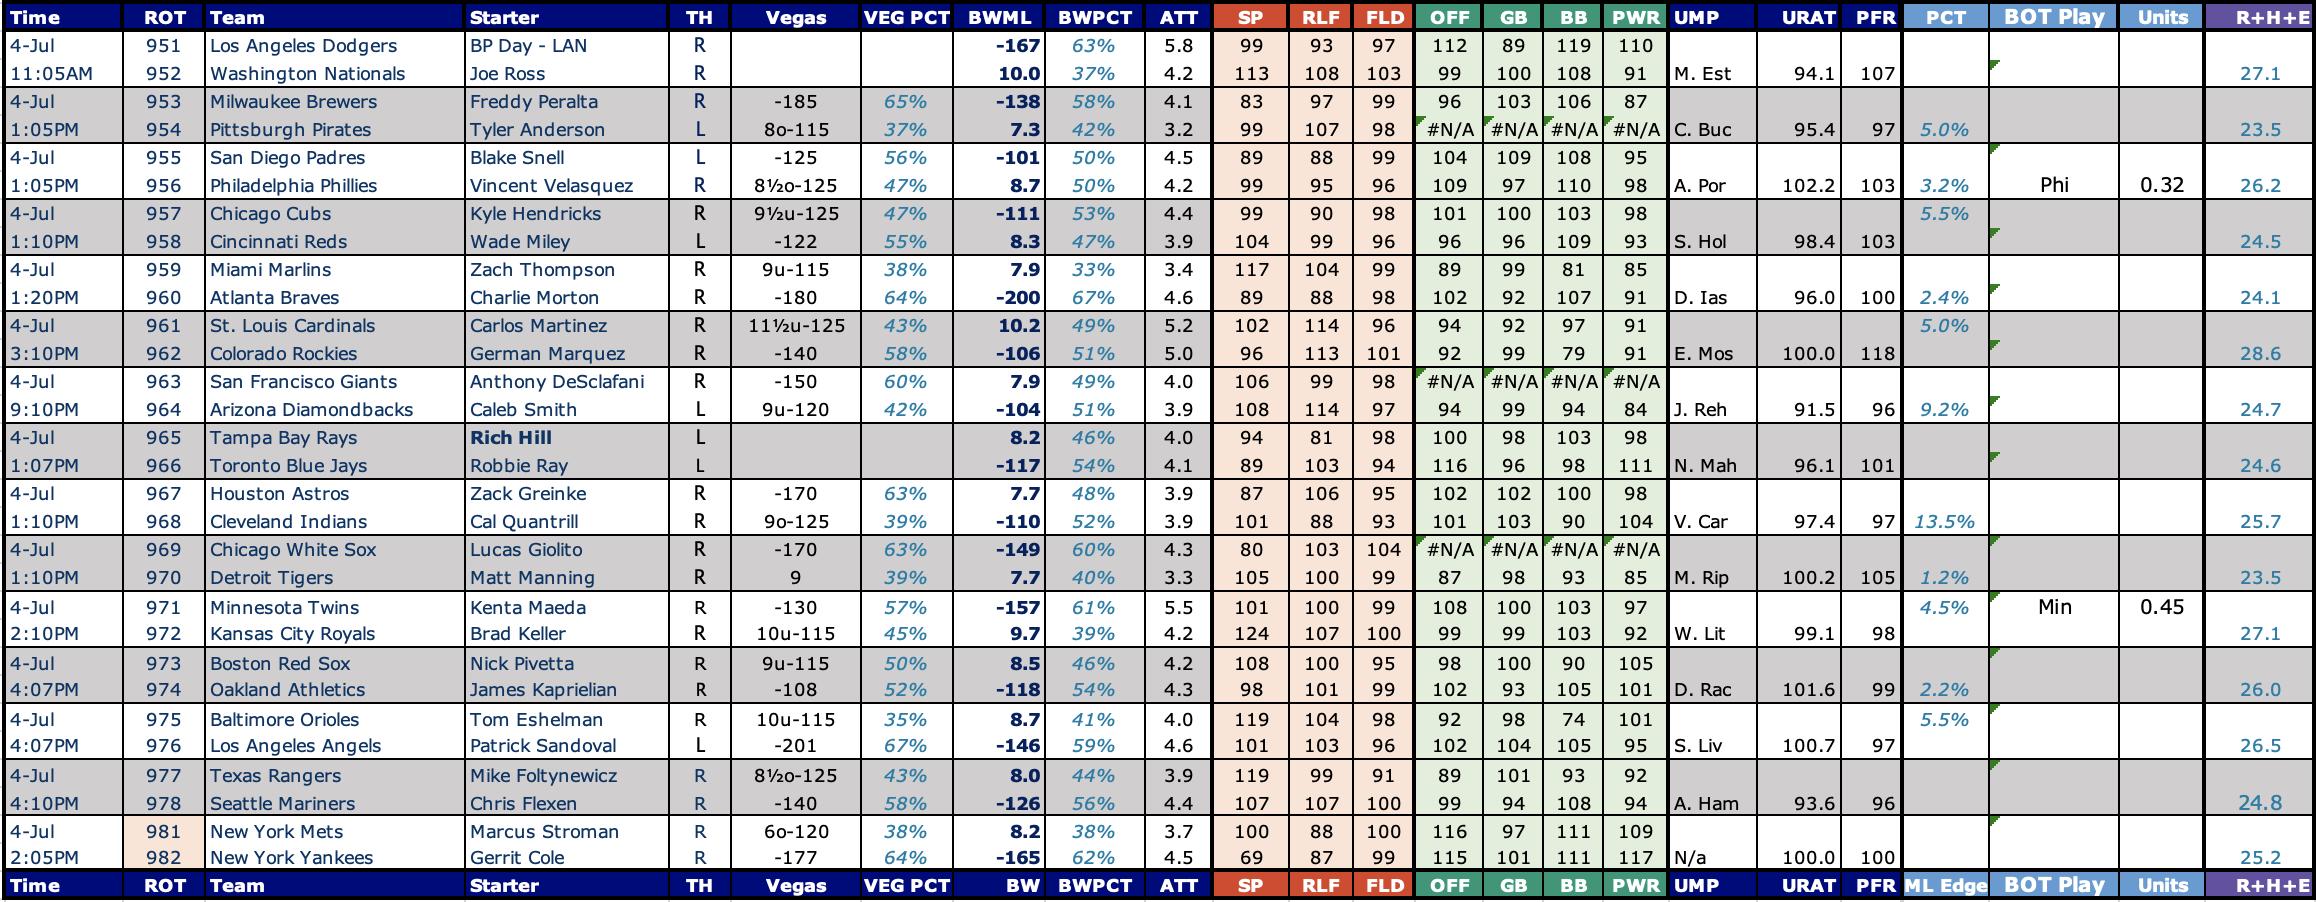 Baseball Betting Projections, & Sports betting picks